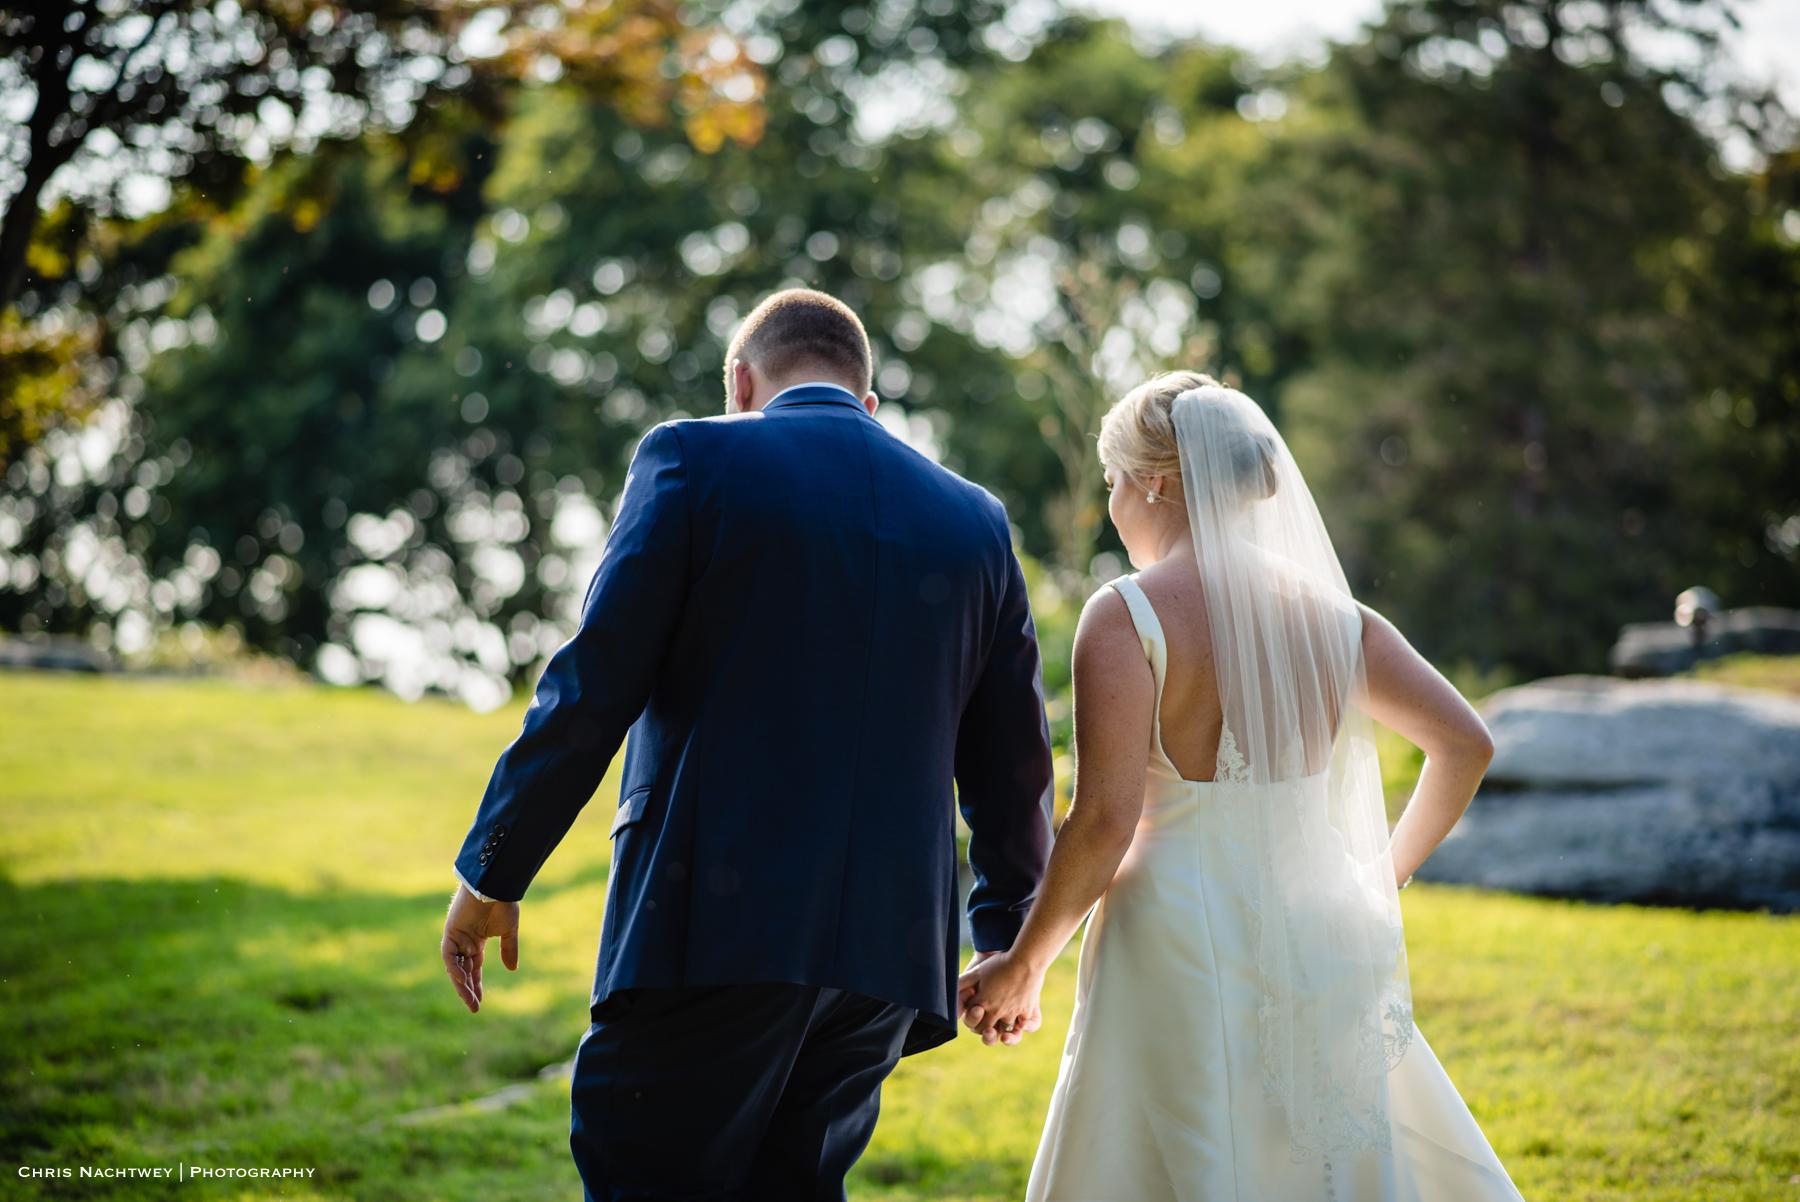 photos-wedding-haley-mansion-mystic-ct-chris-nachtwey-photography-2019-21.jpg